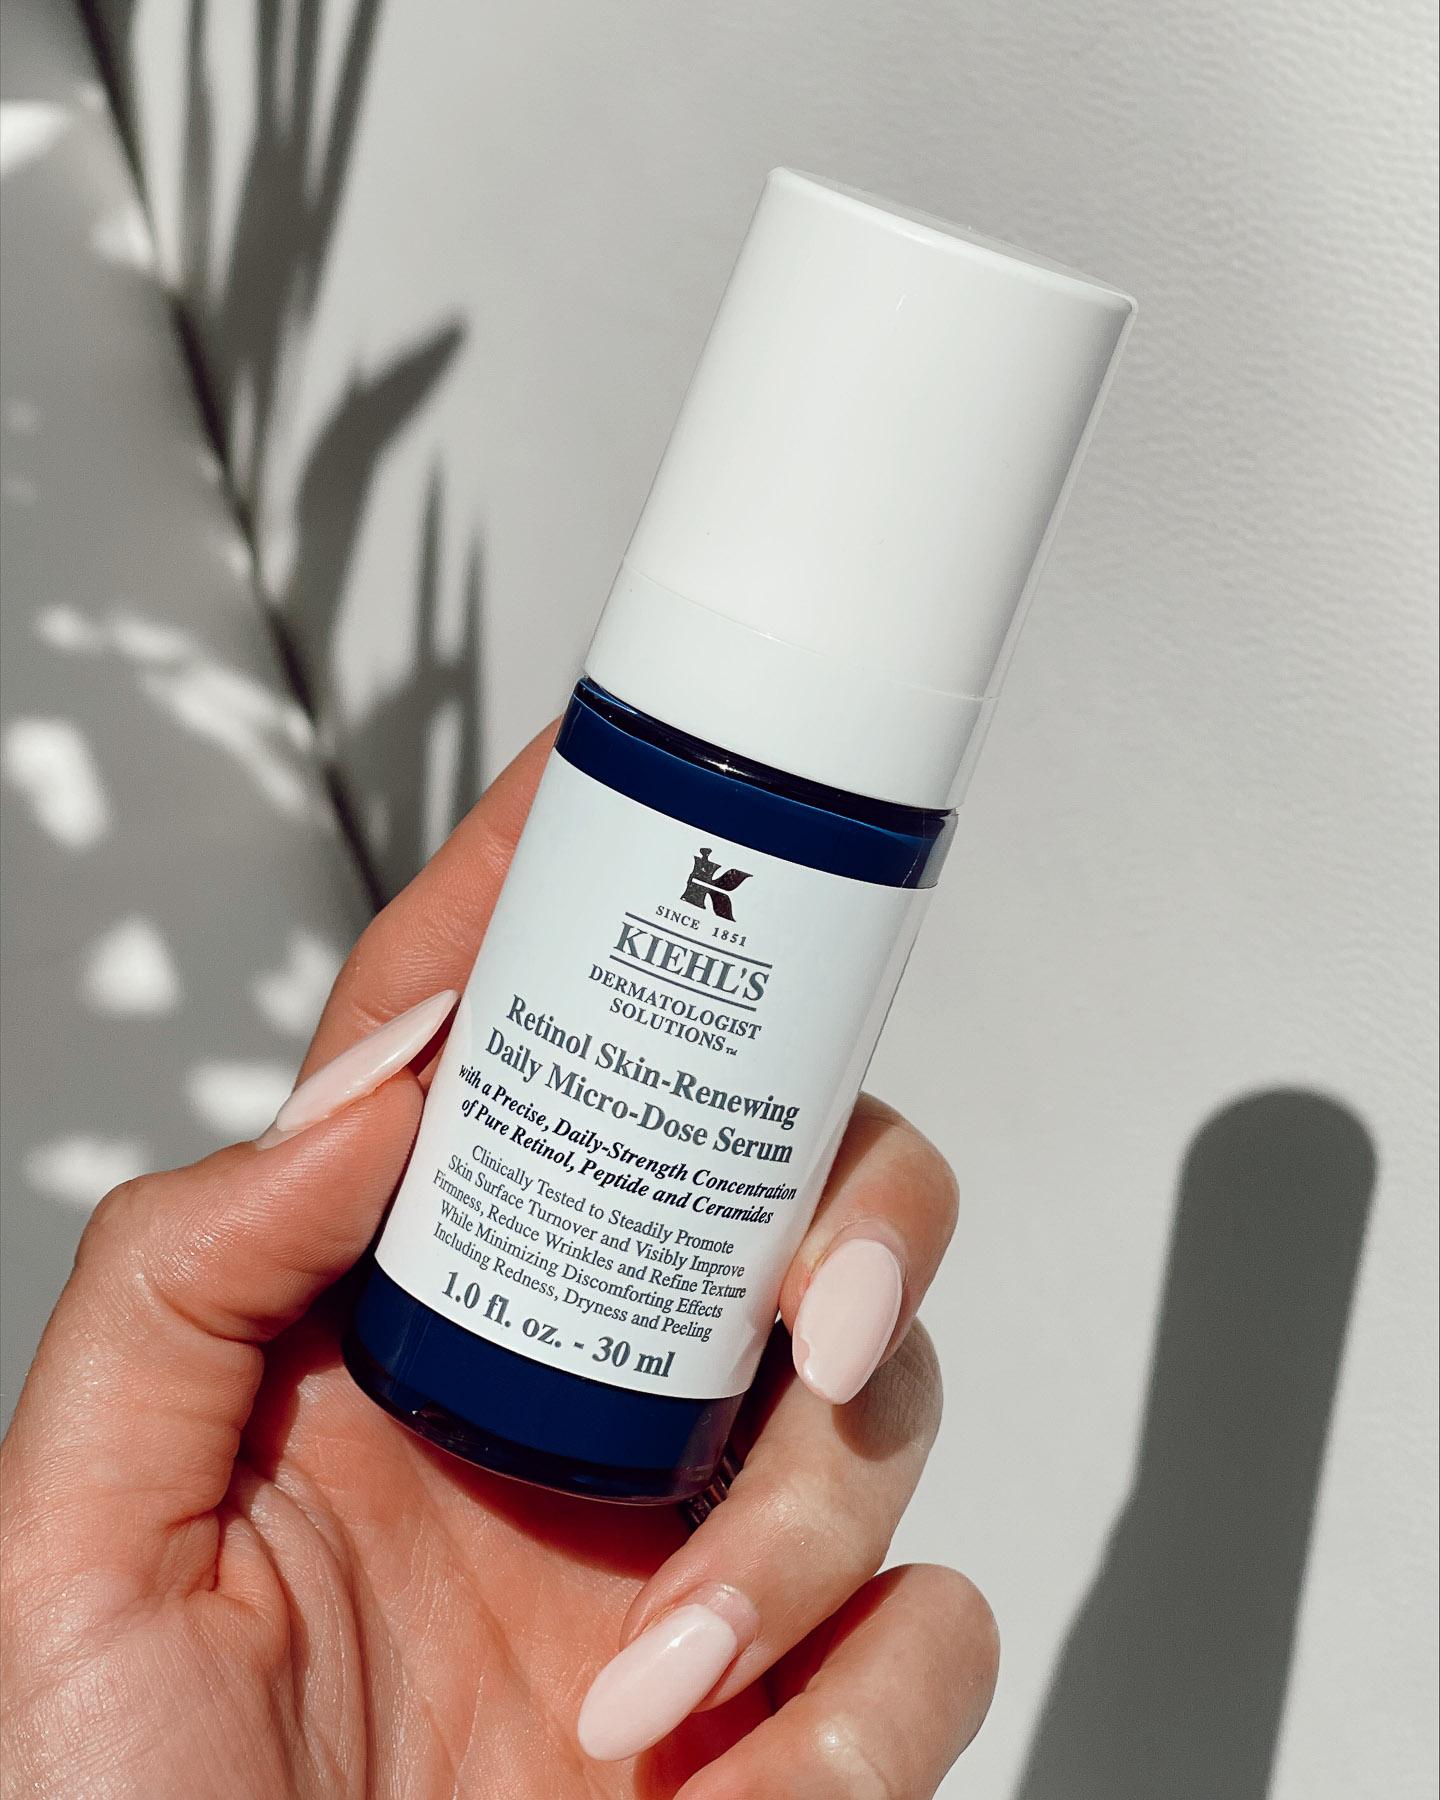 kiehls retinol microdose serum review